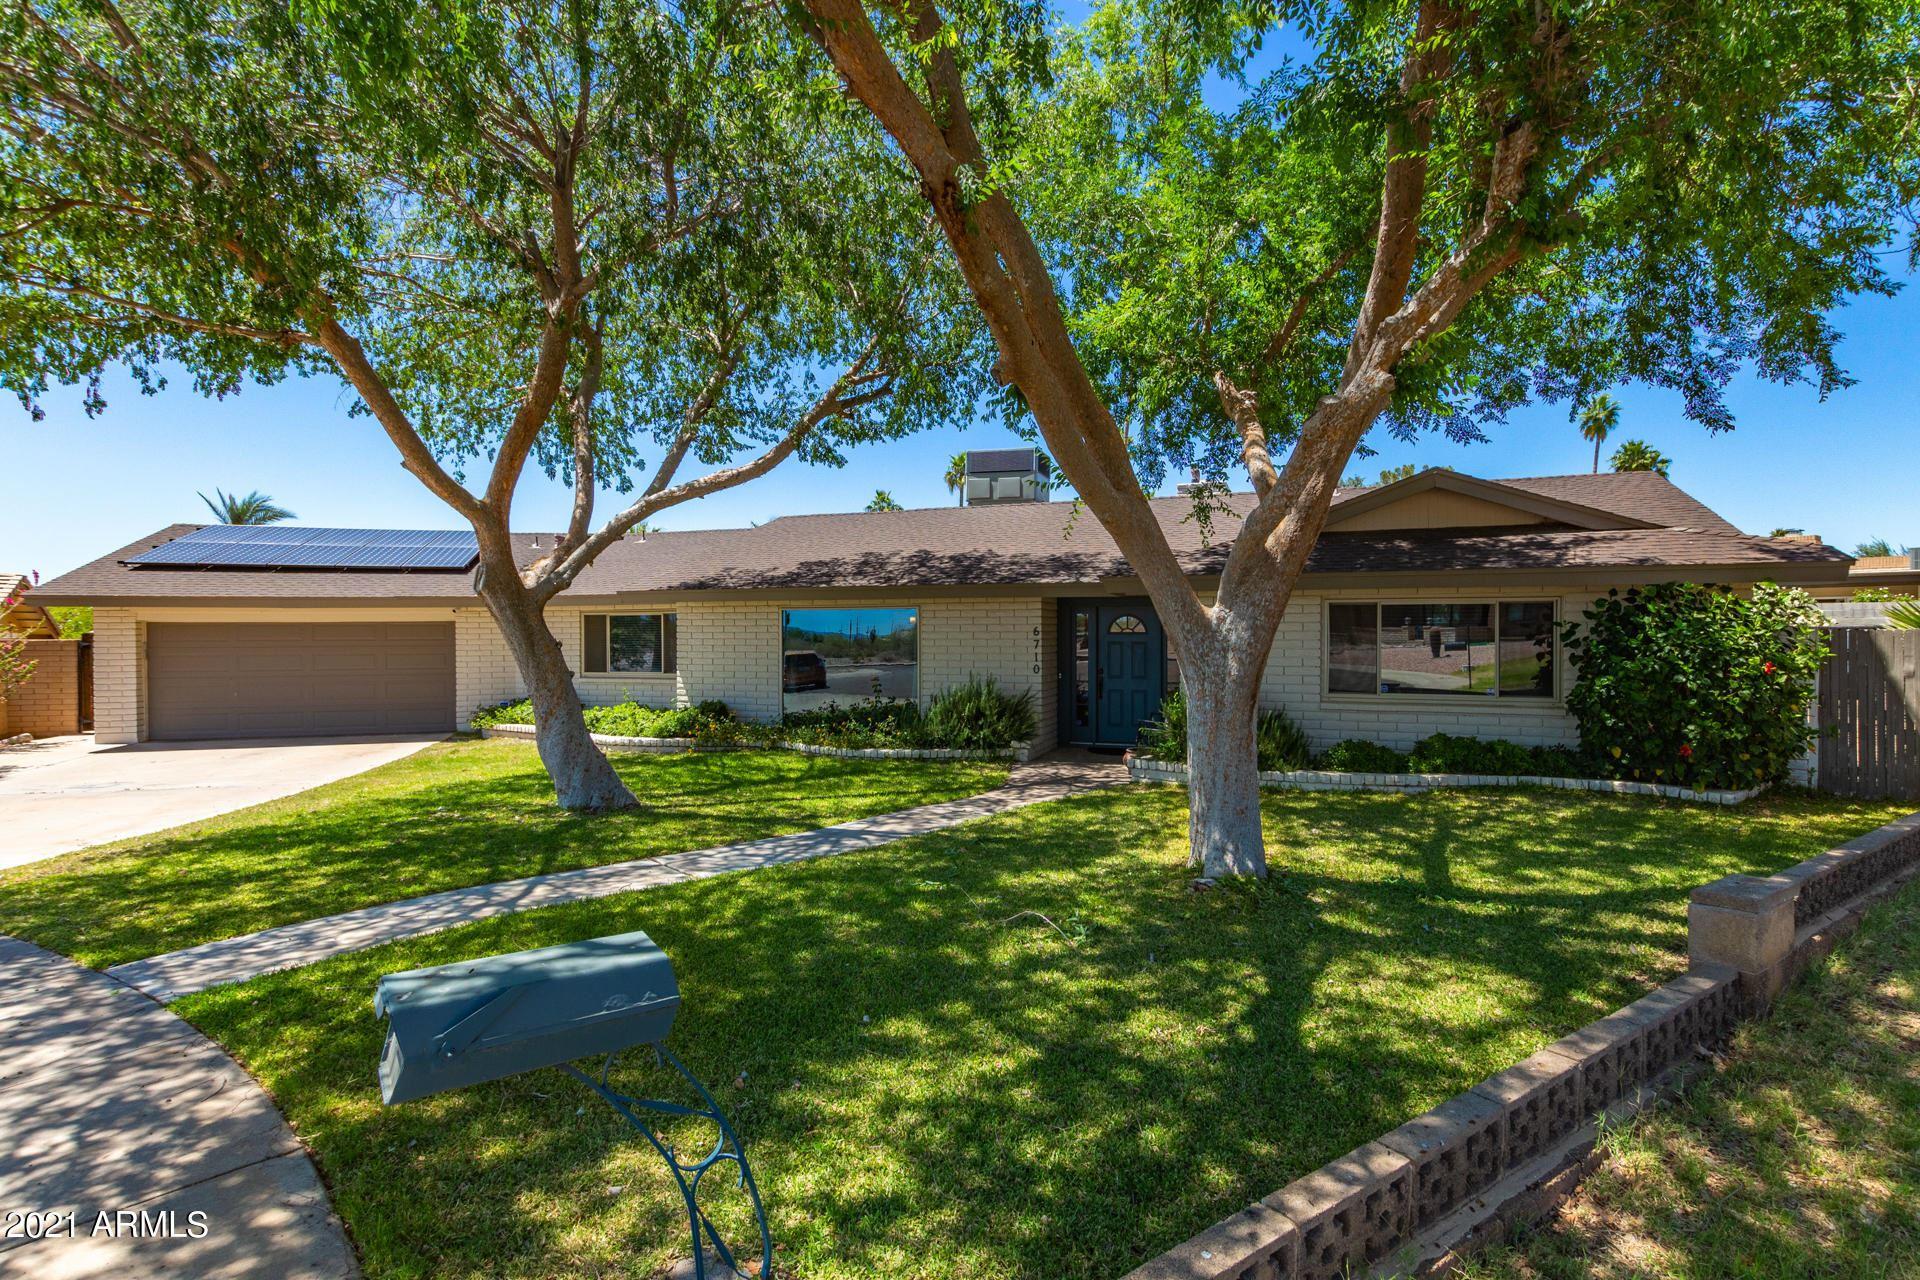 6710 N 22ND Street, Phoenix, AZ 85016 - MLS#: 6233700